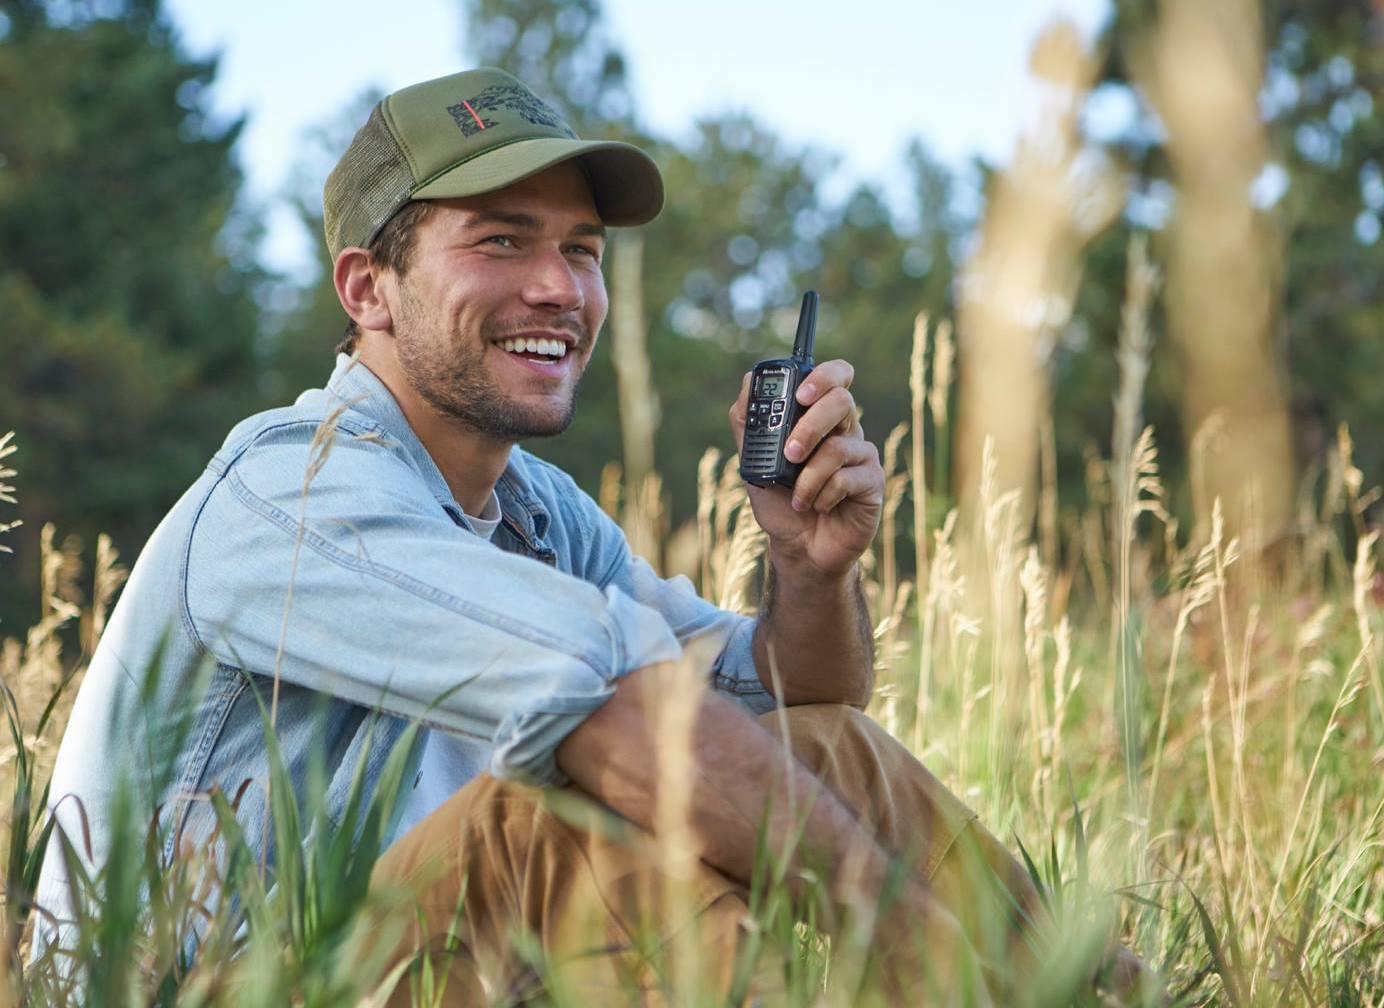 Midland walkie talkies